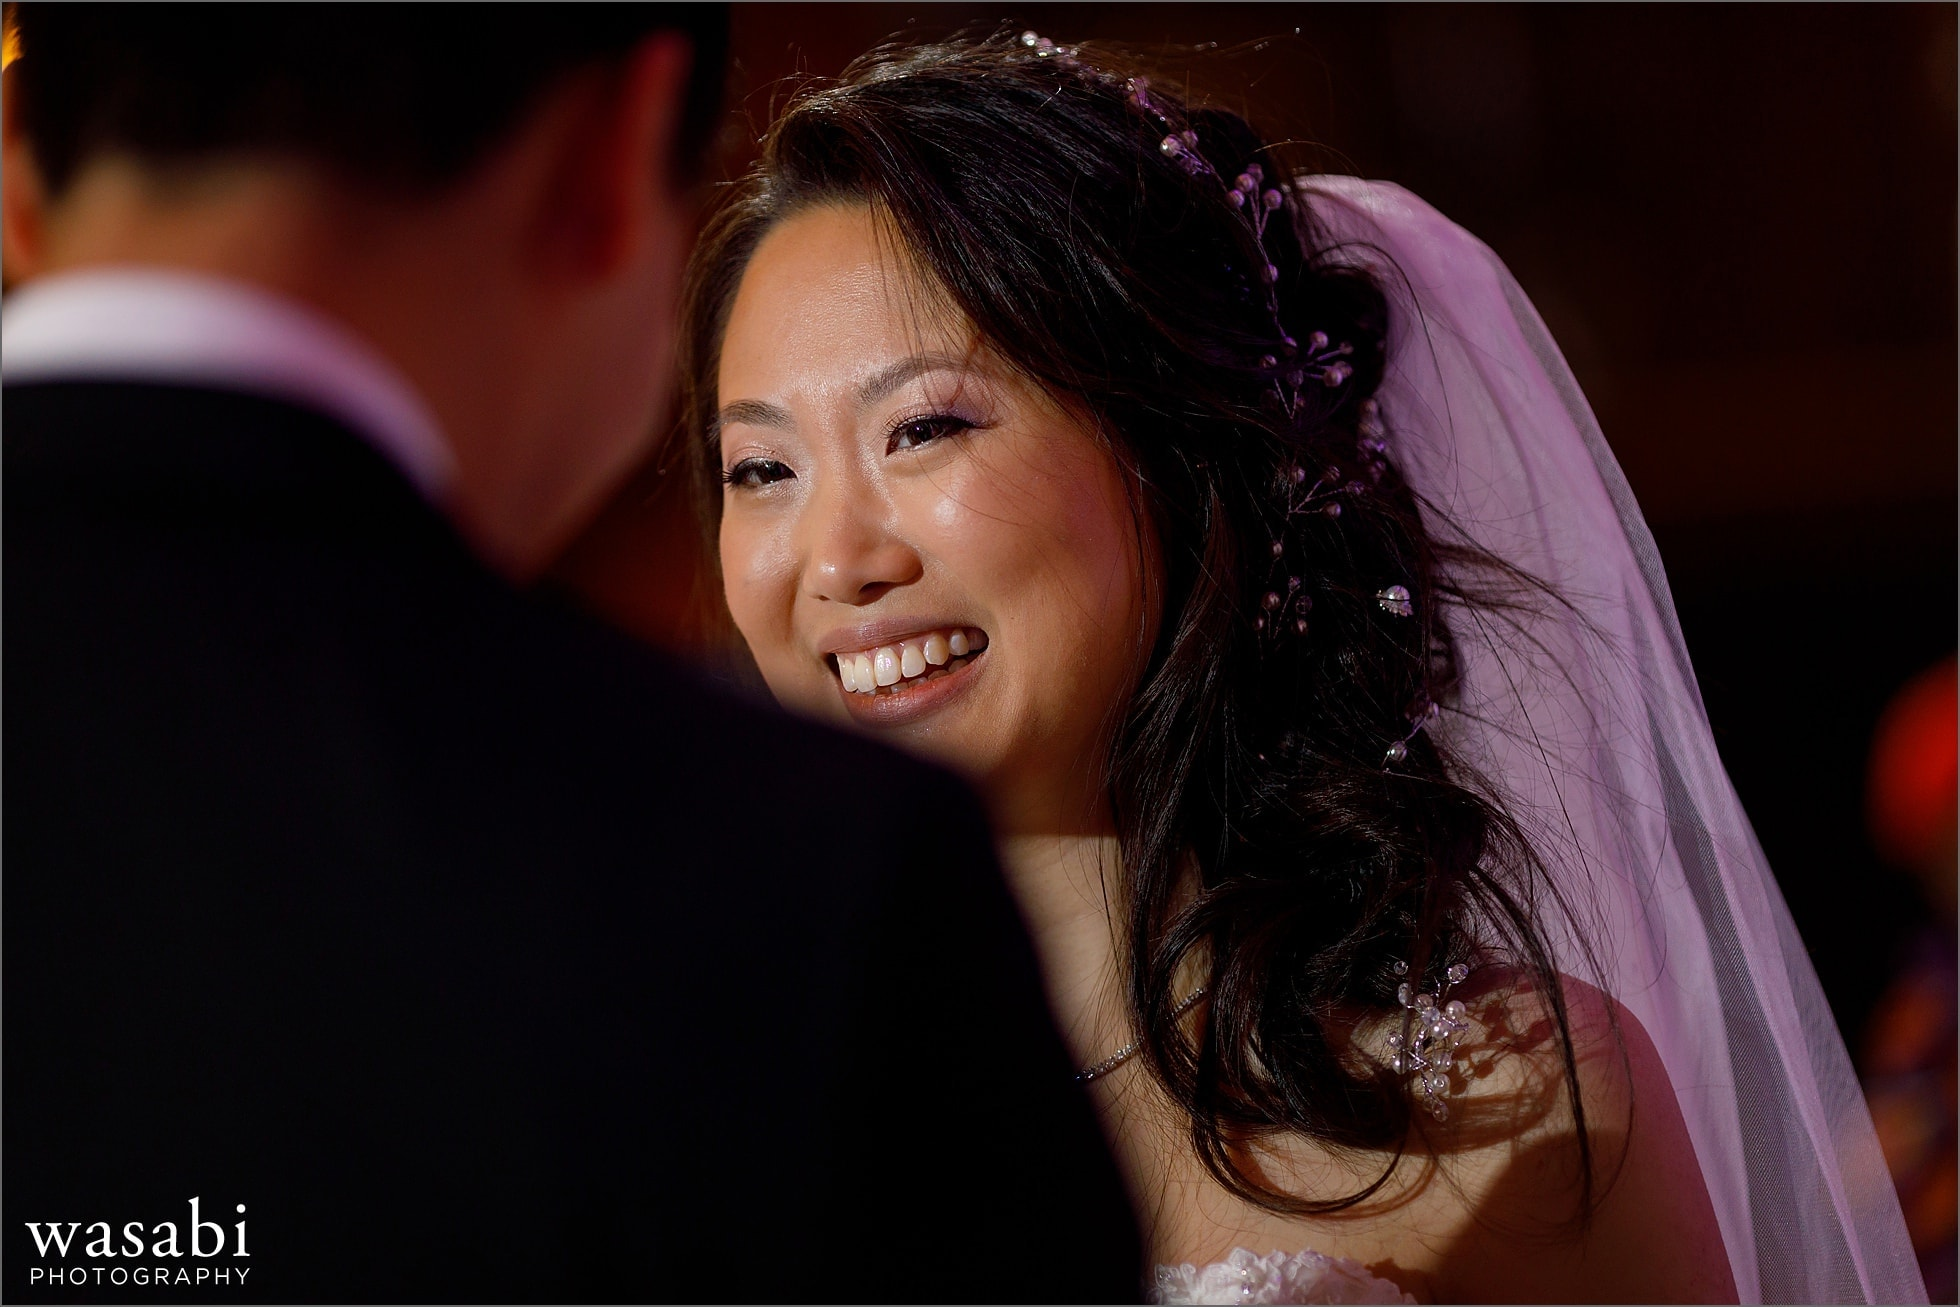 Closeup of bride smiling during wedding ceremony